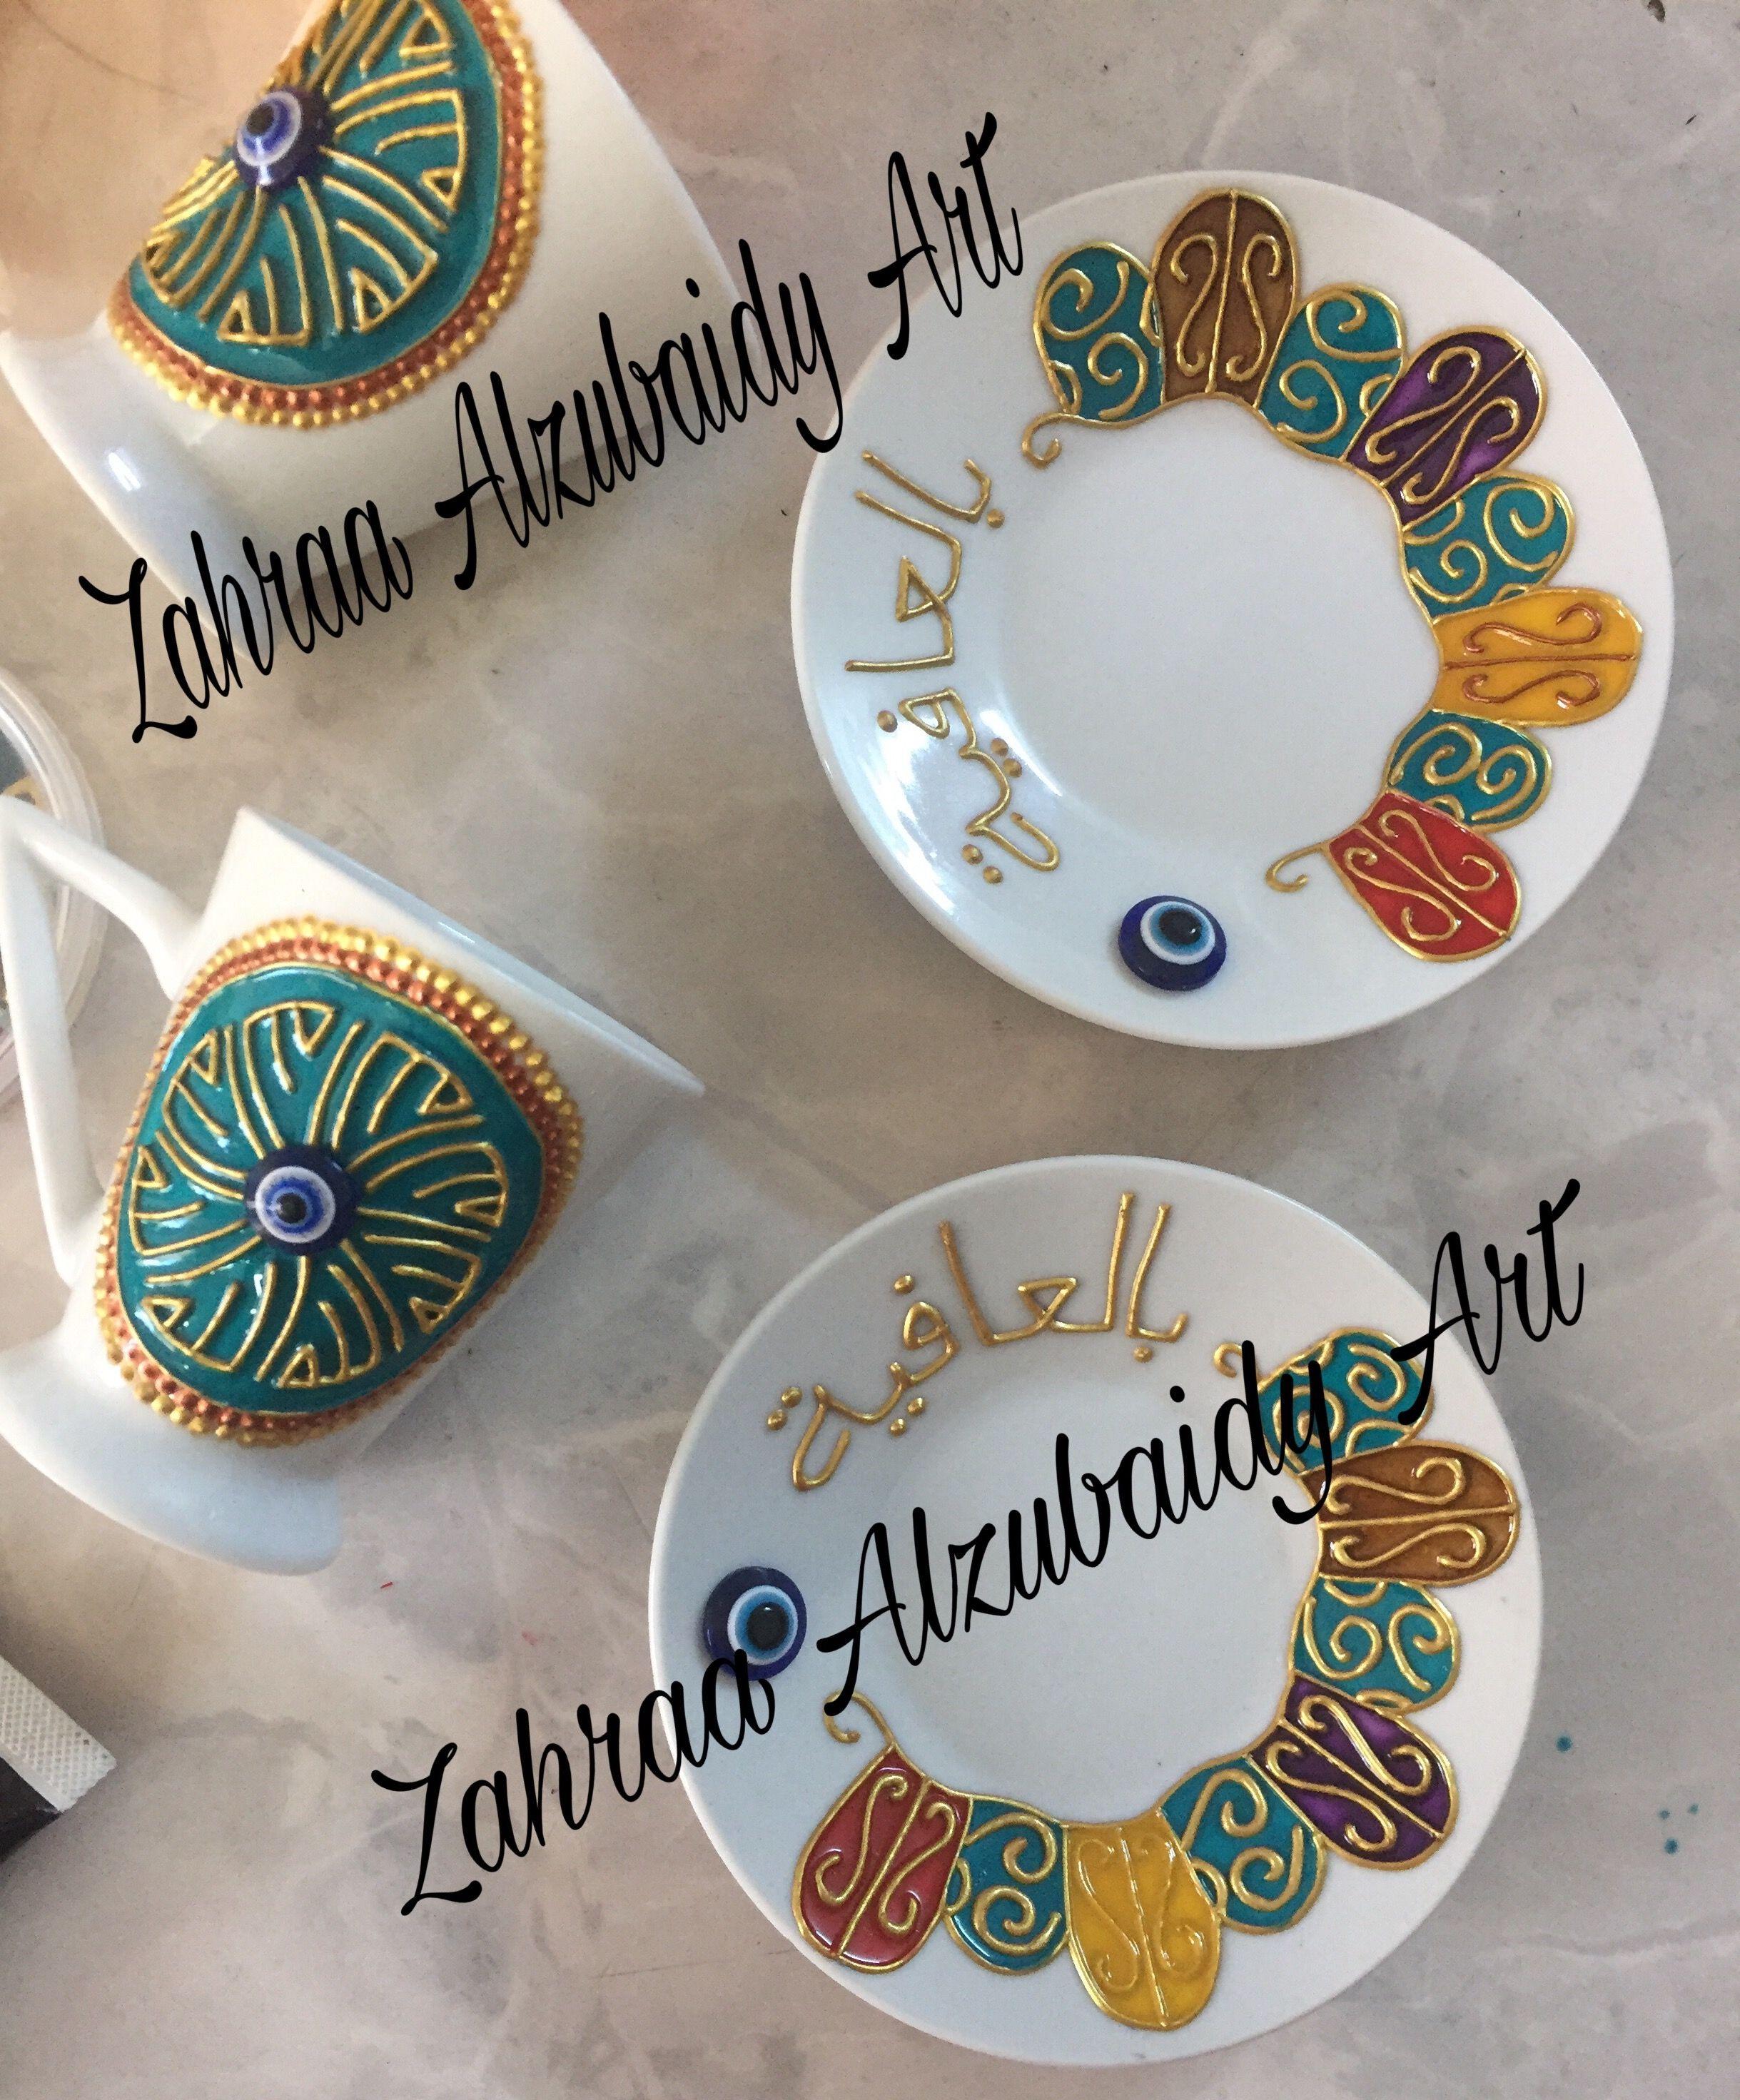 رسم على الفناجين باستعمال الوان الزجاج Painting Glassware Art Paint Party Hand Painted Glassware